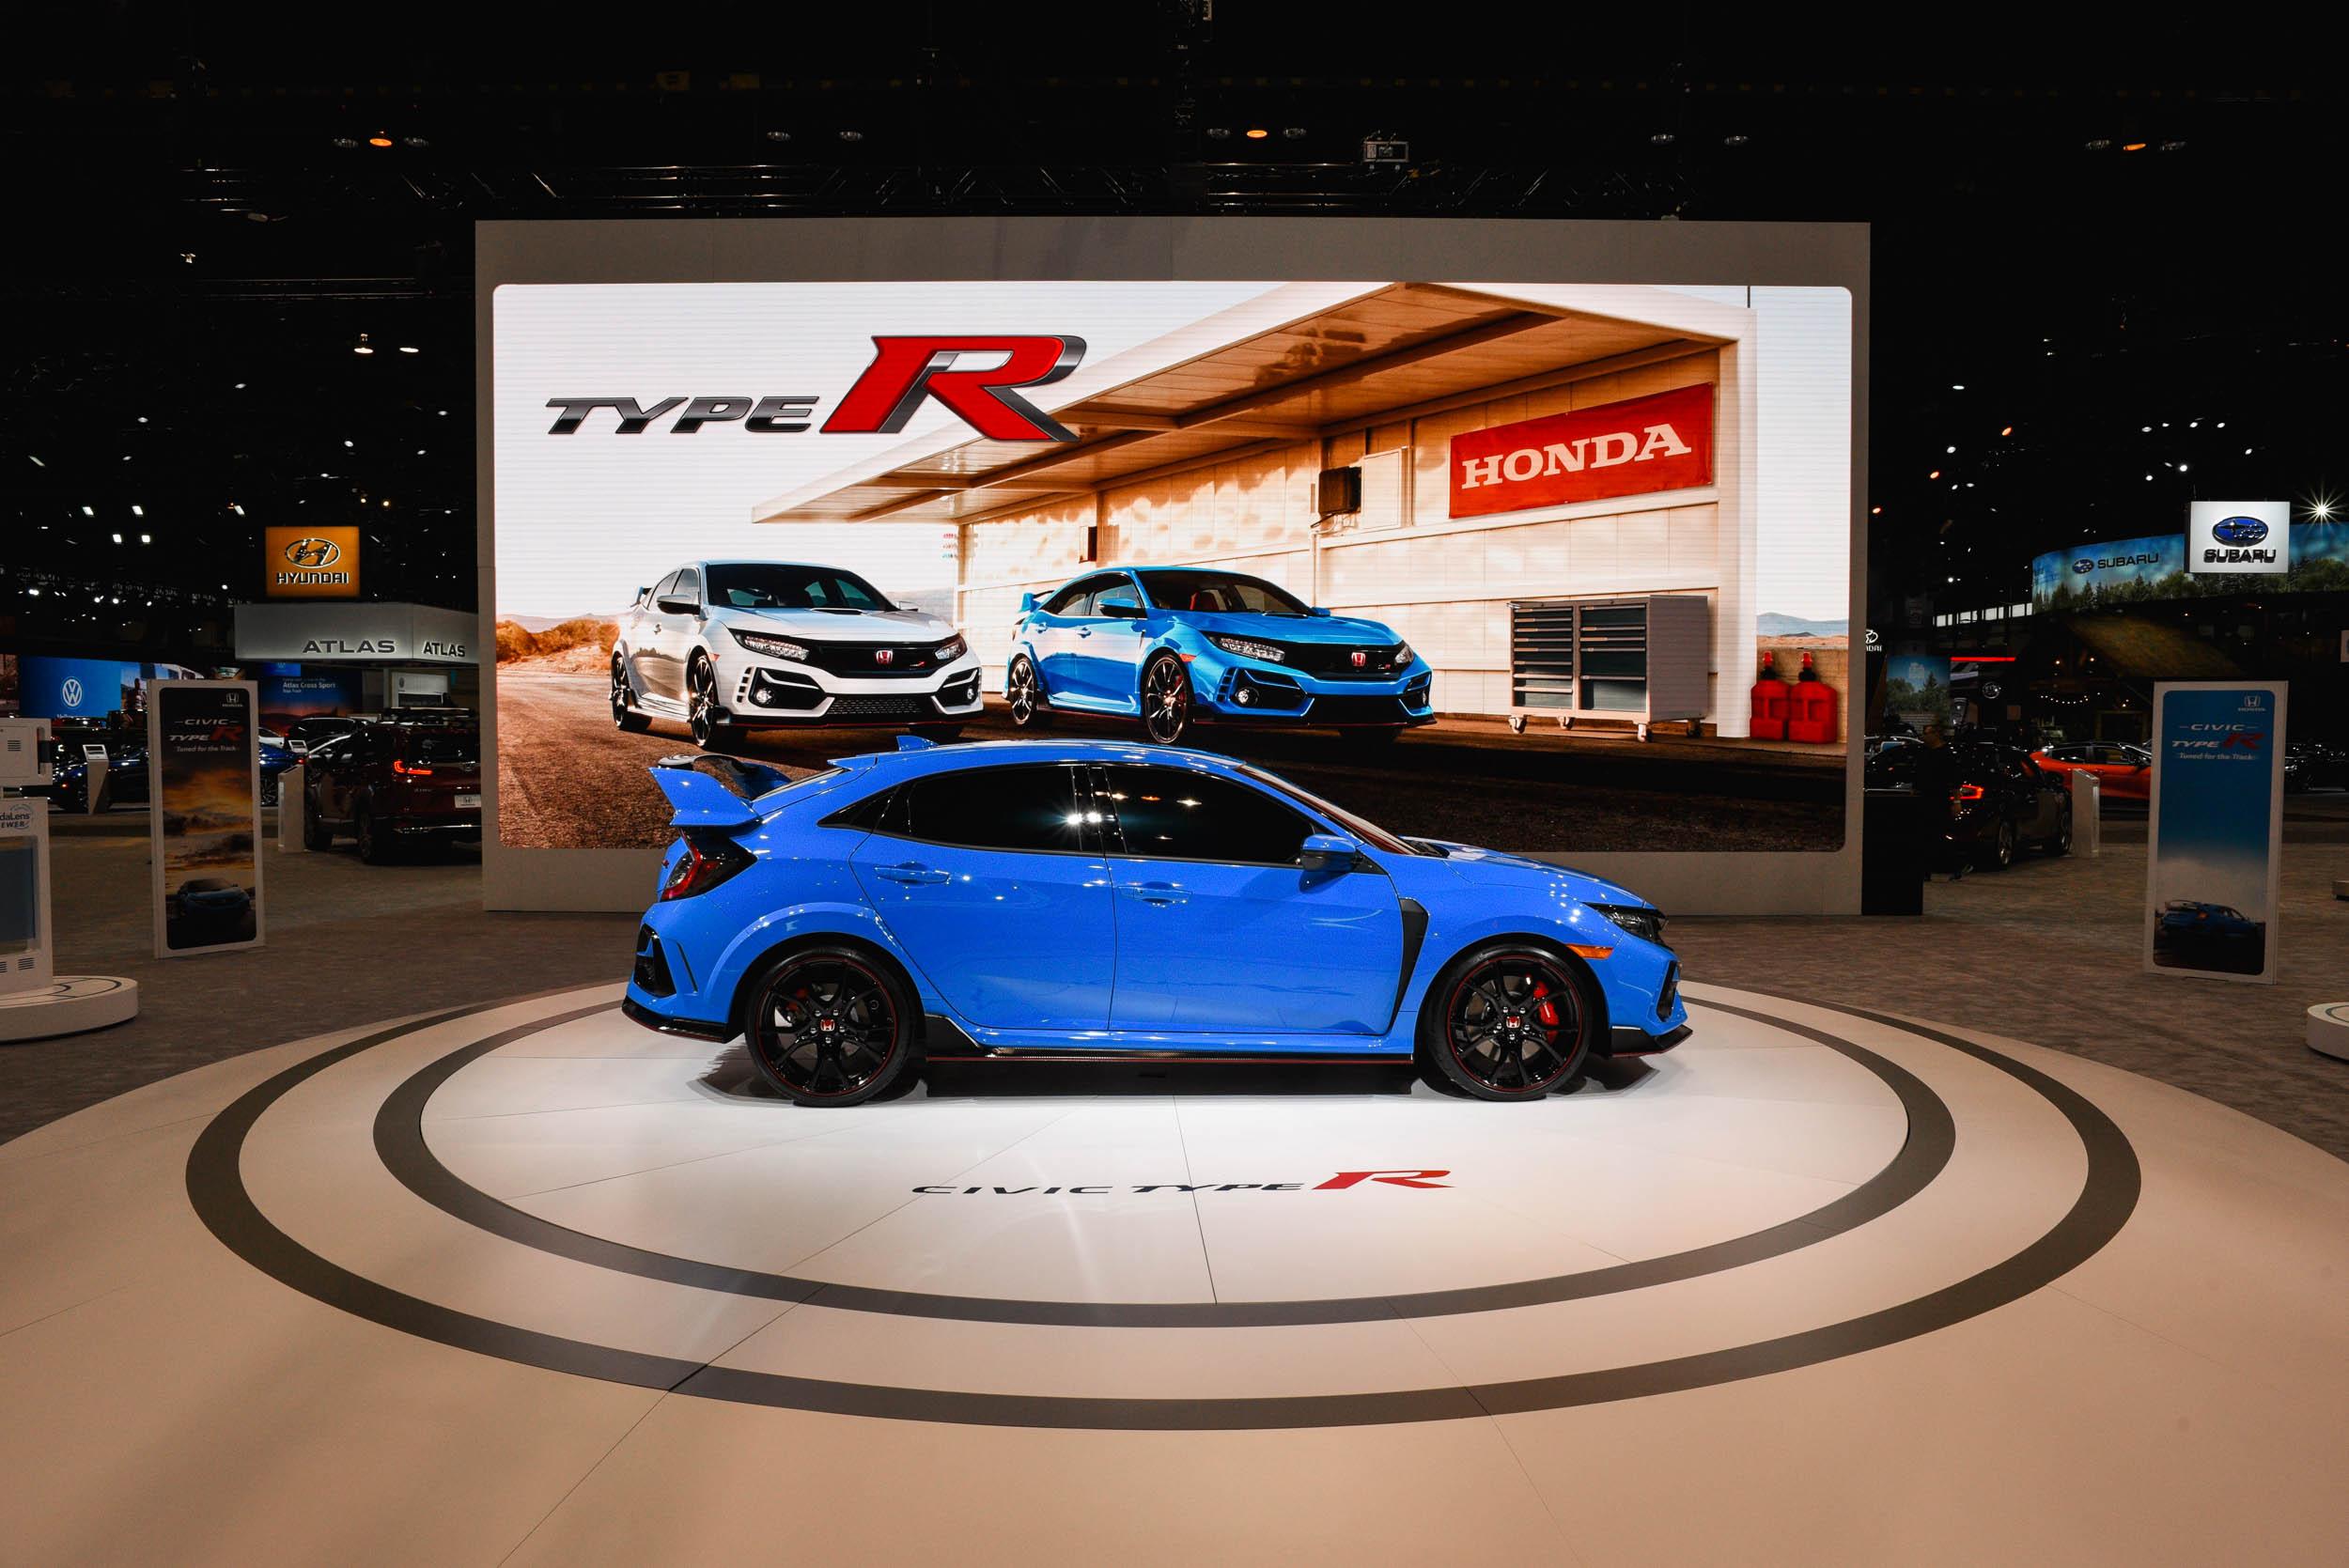 2020 Honda Civic Type R - Chicago Auto Show